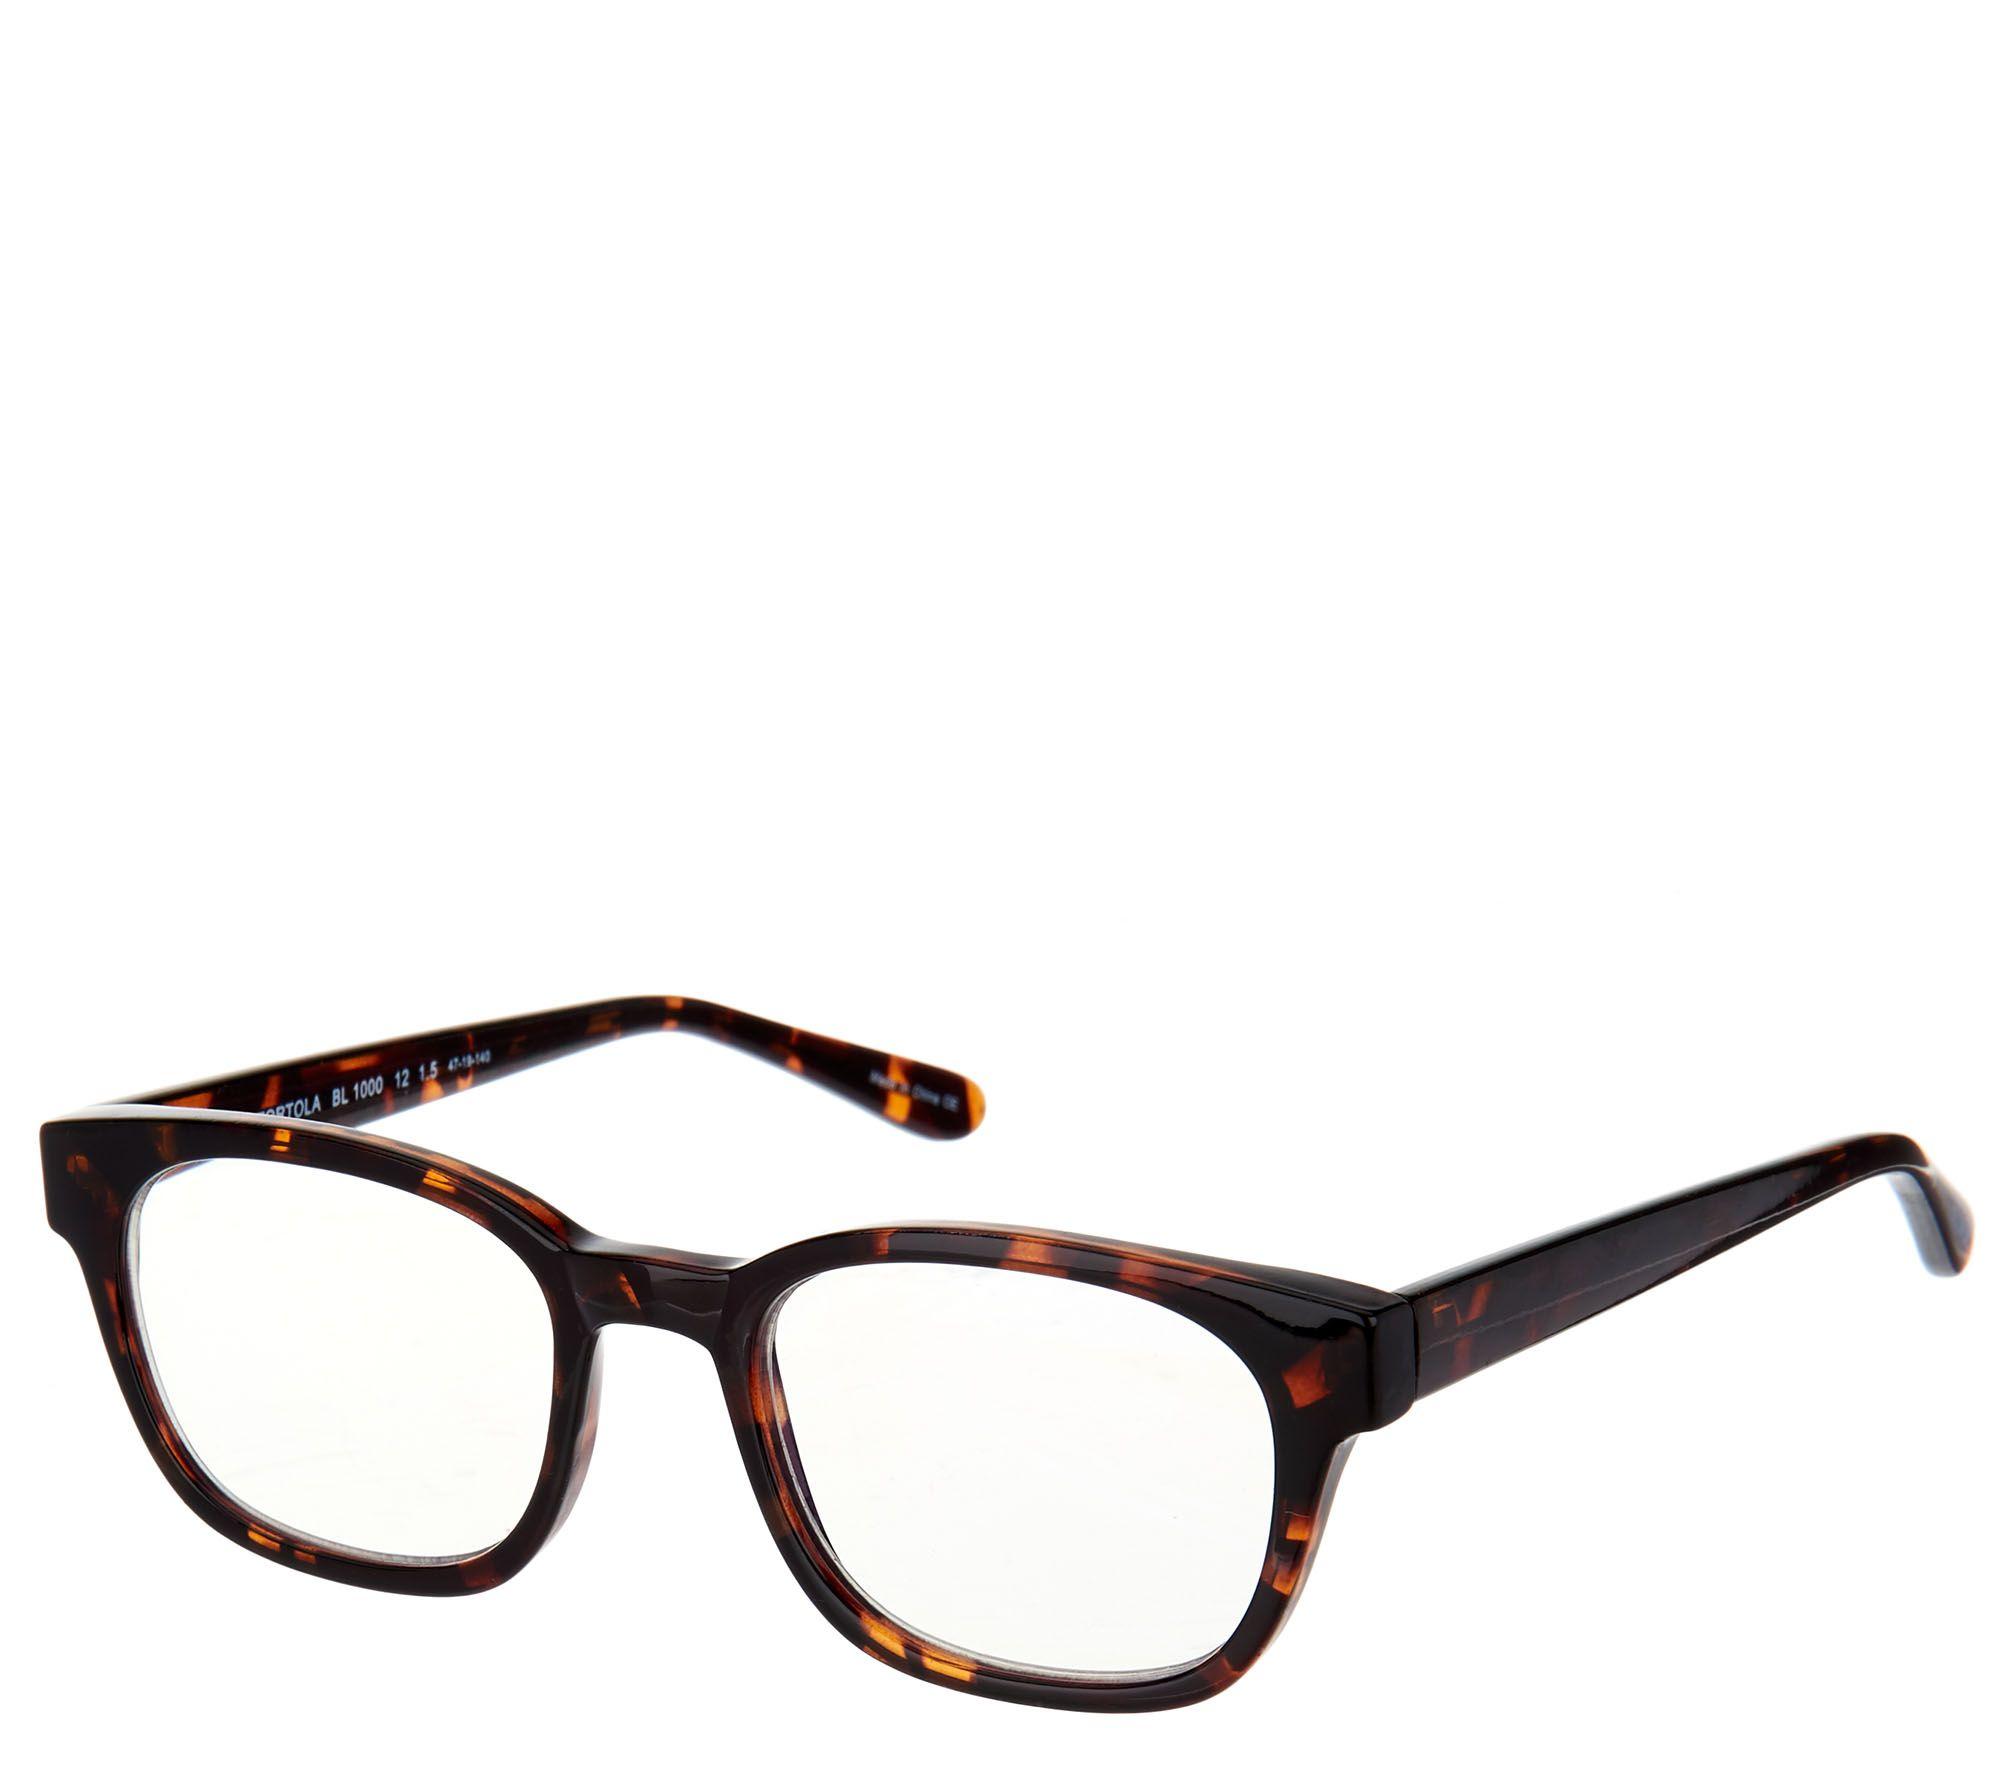 d996157e74e BluVue Blue Light Reading Glasses Strength 1-2.5 - Page 1 — QVC.com